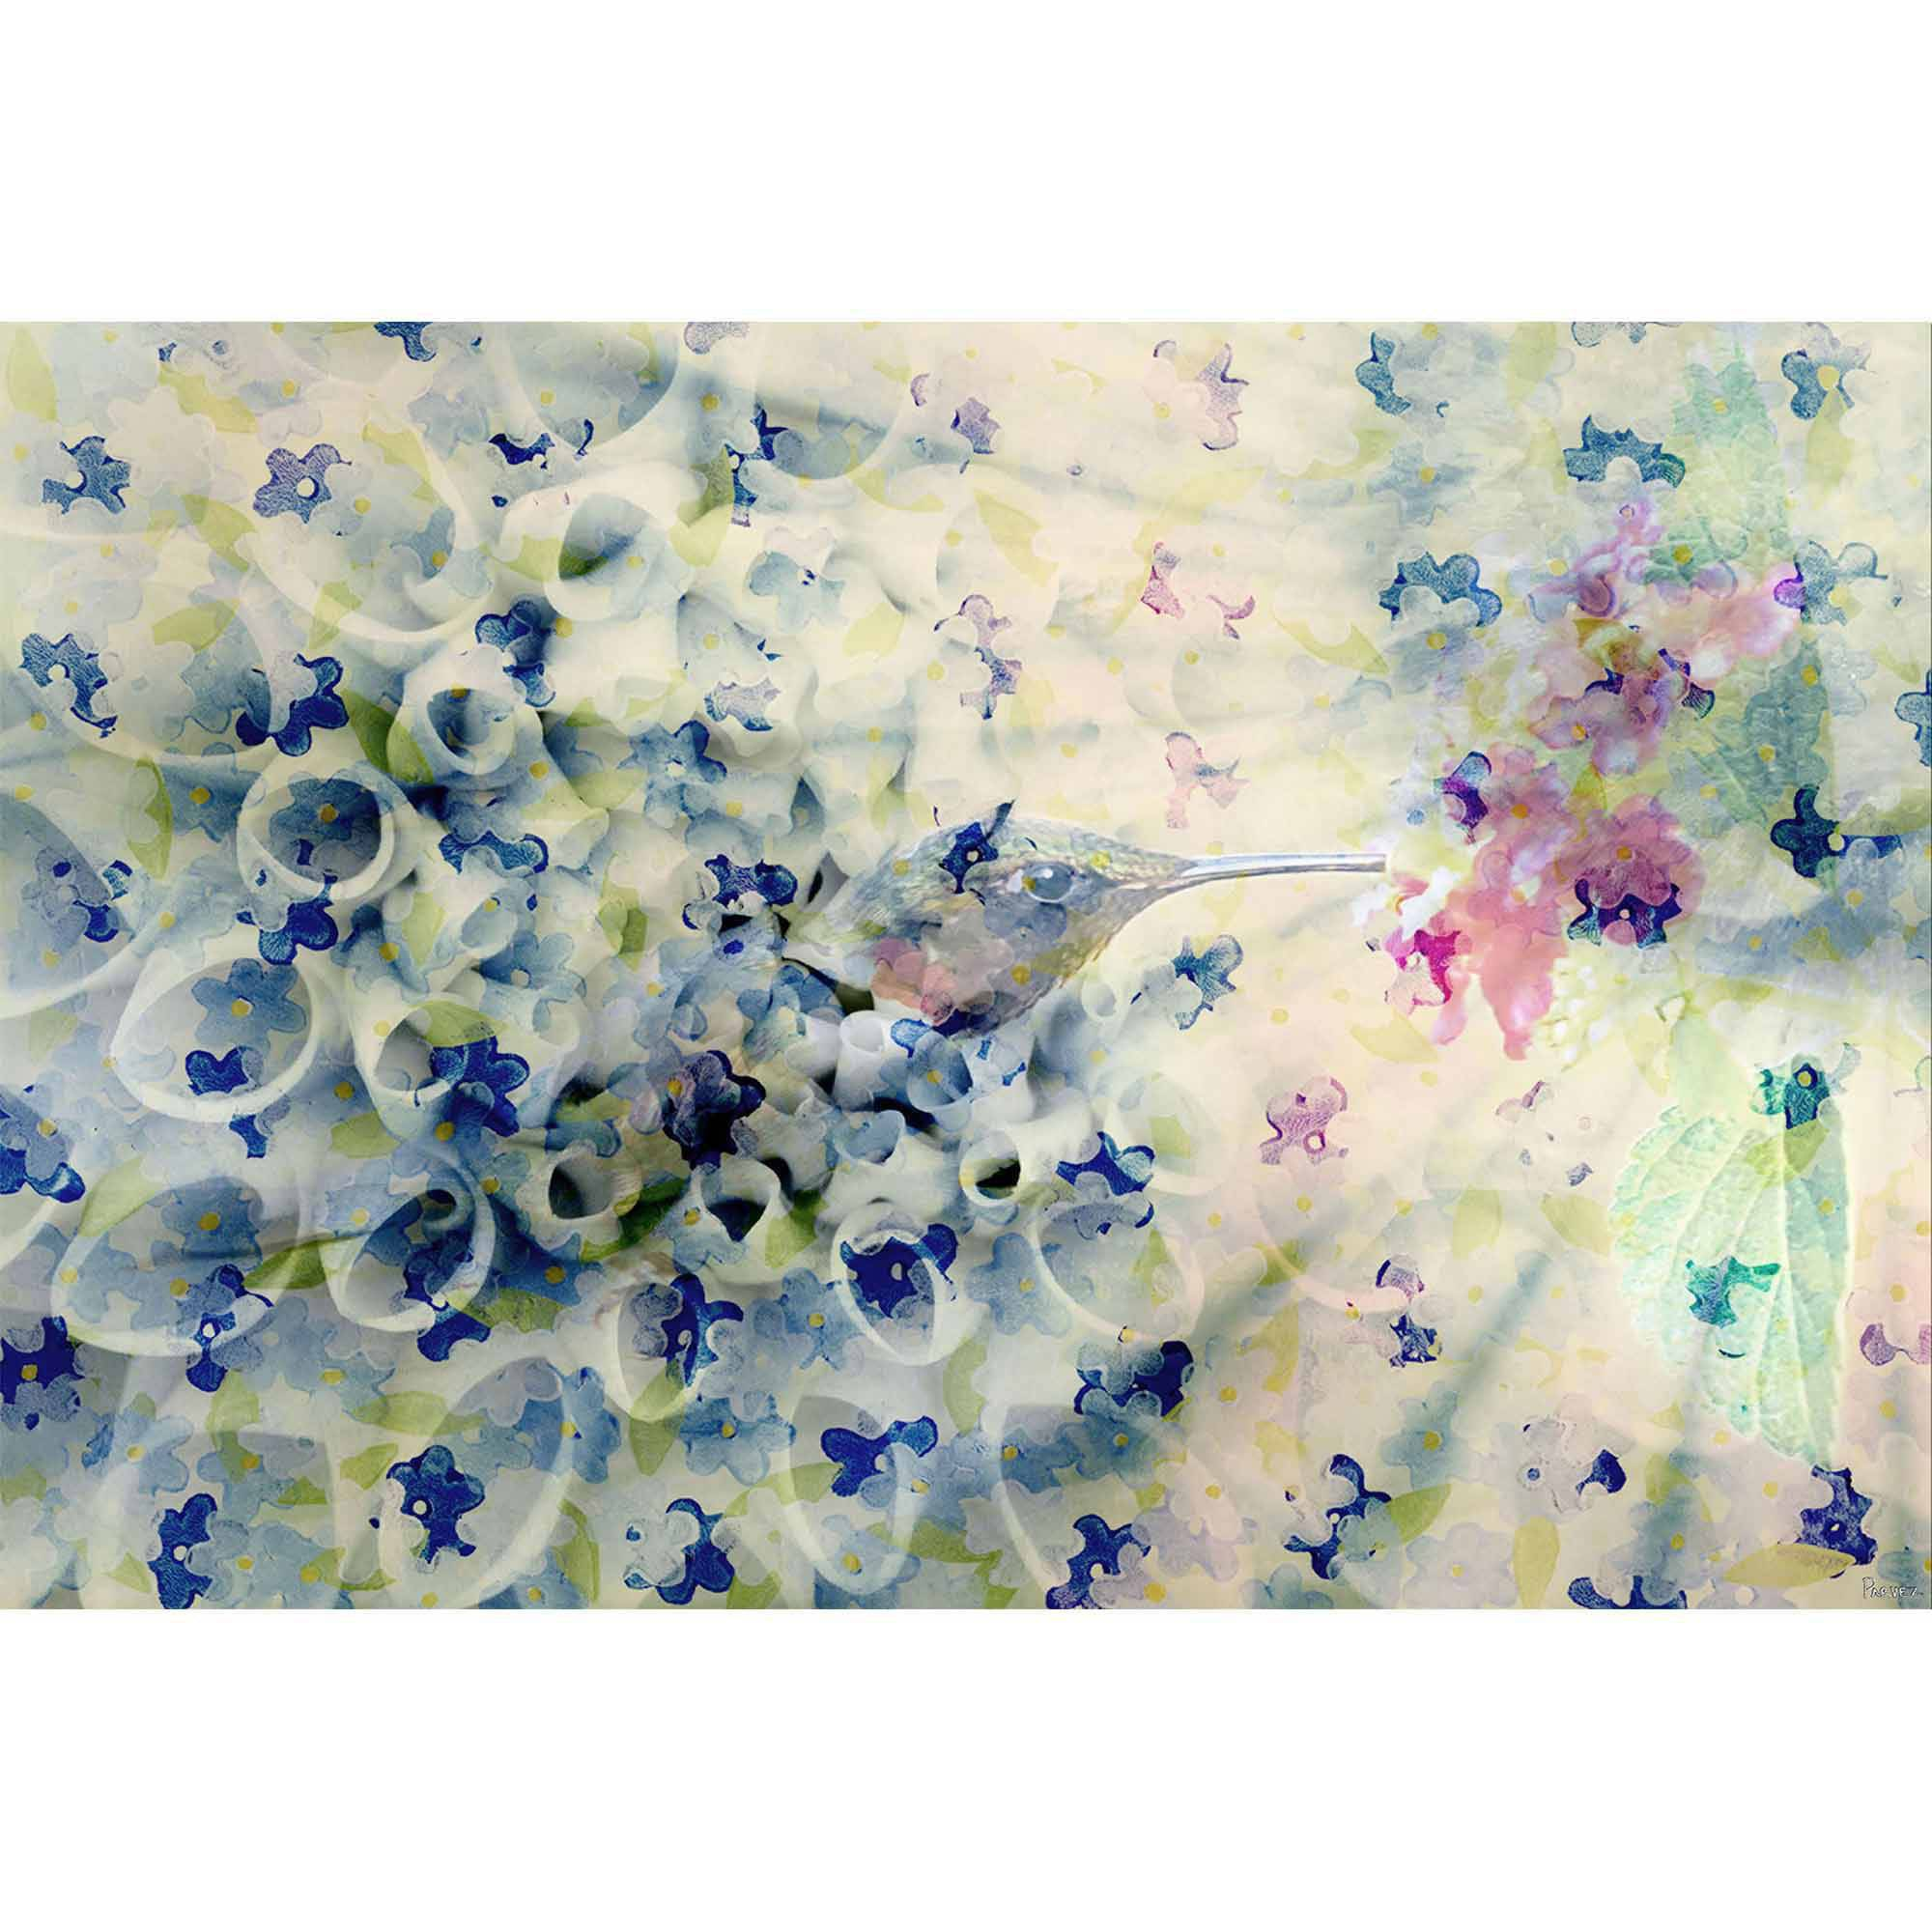 Parvez Taj Humming Art Print on Premium Canvas